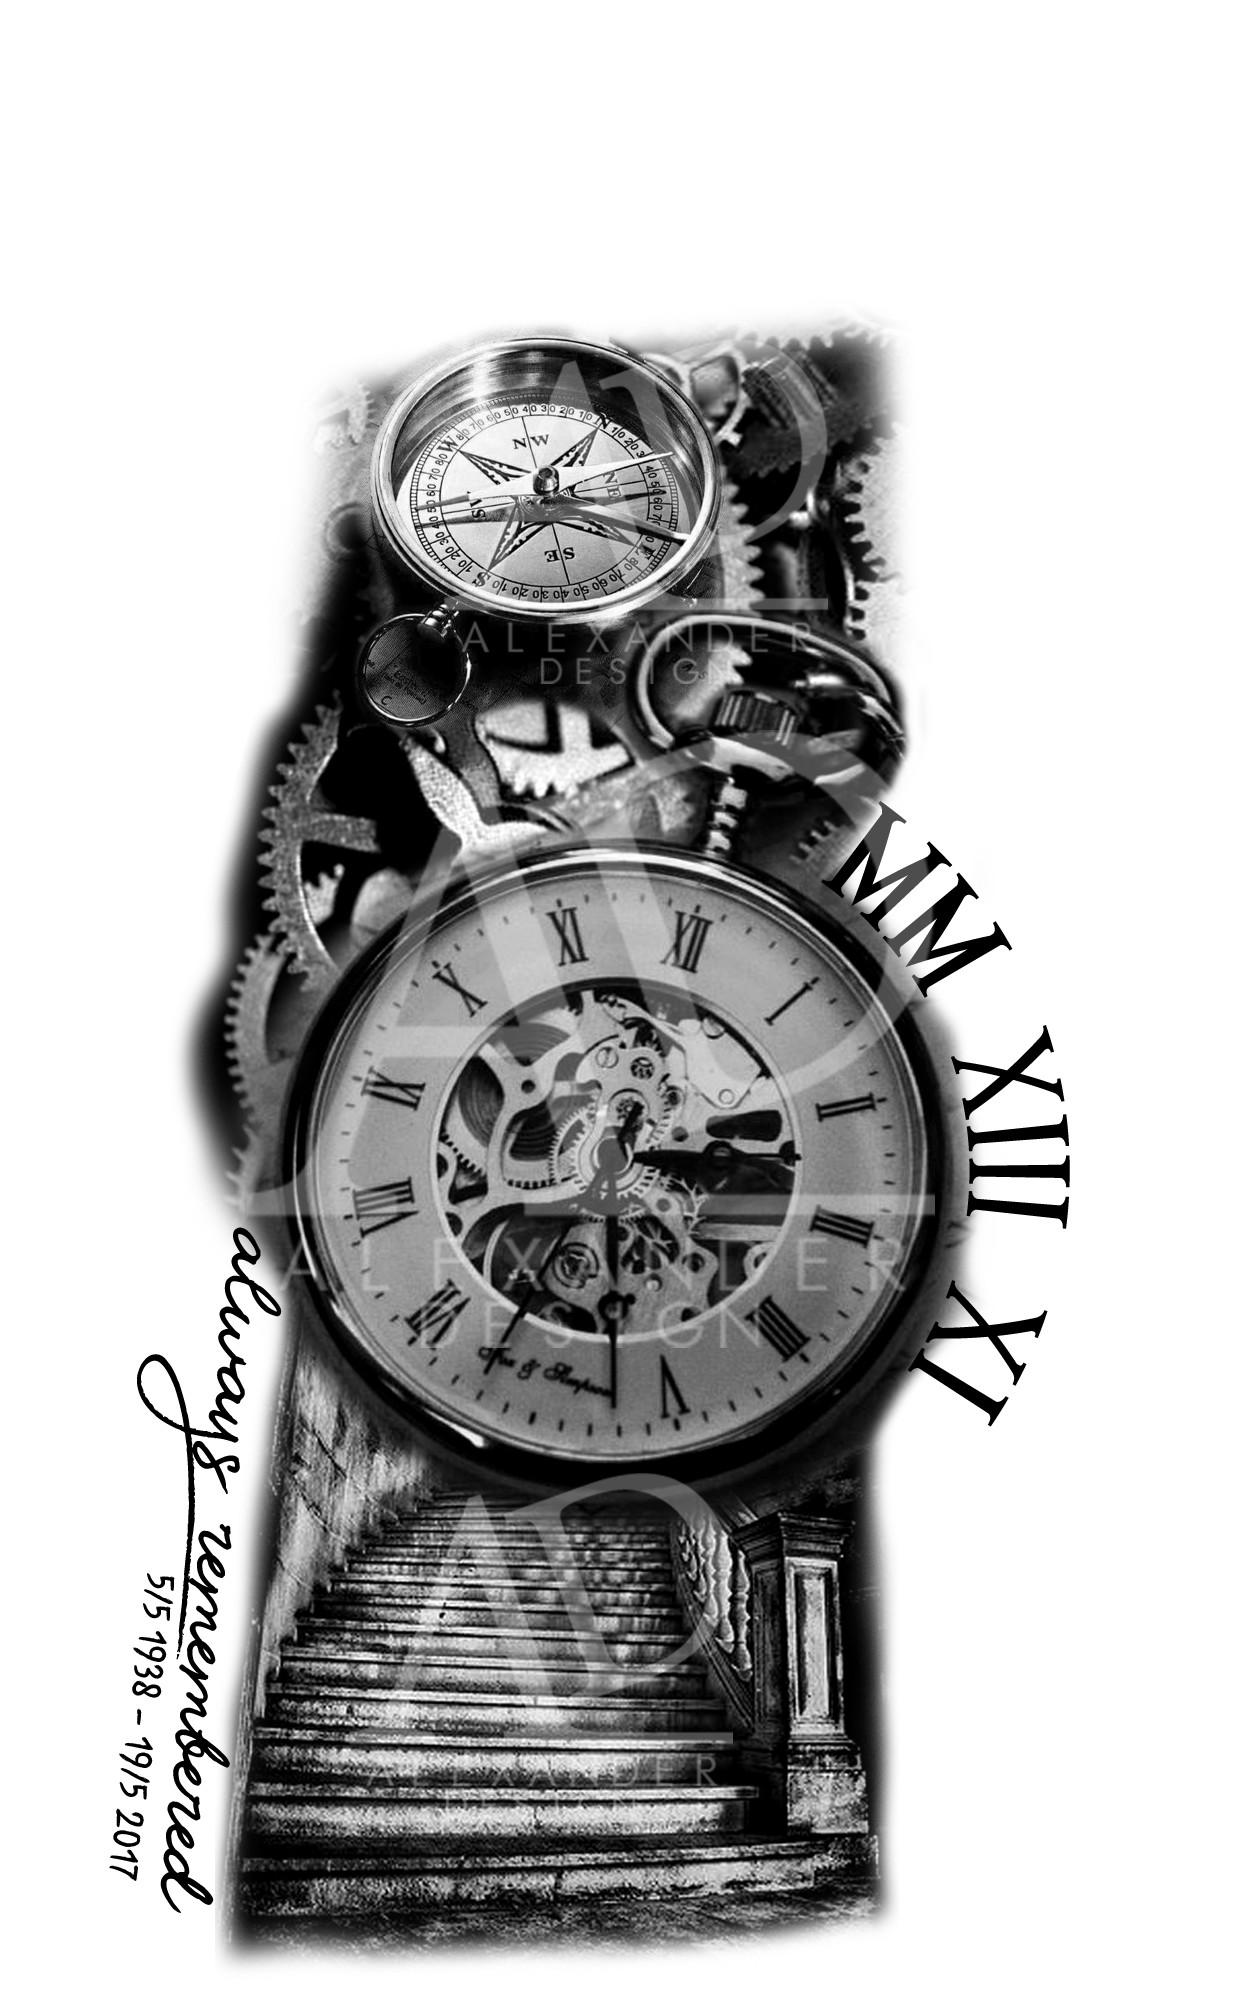 Tattoo Sleeve Design Artwork: Sleeve Tattoo Design, Alexander Design